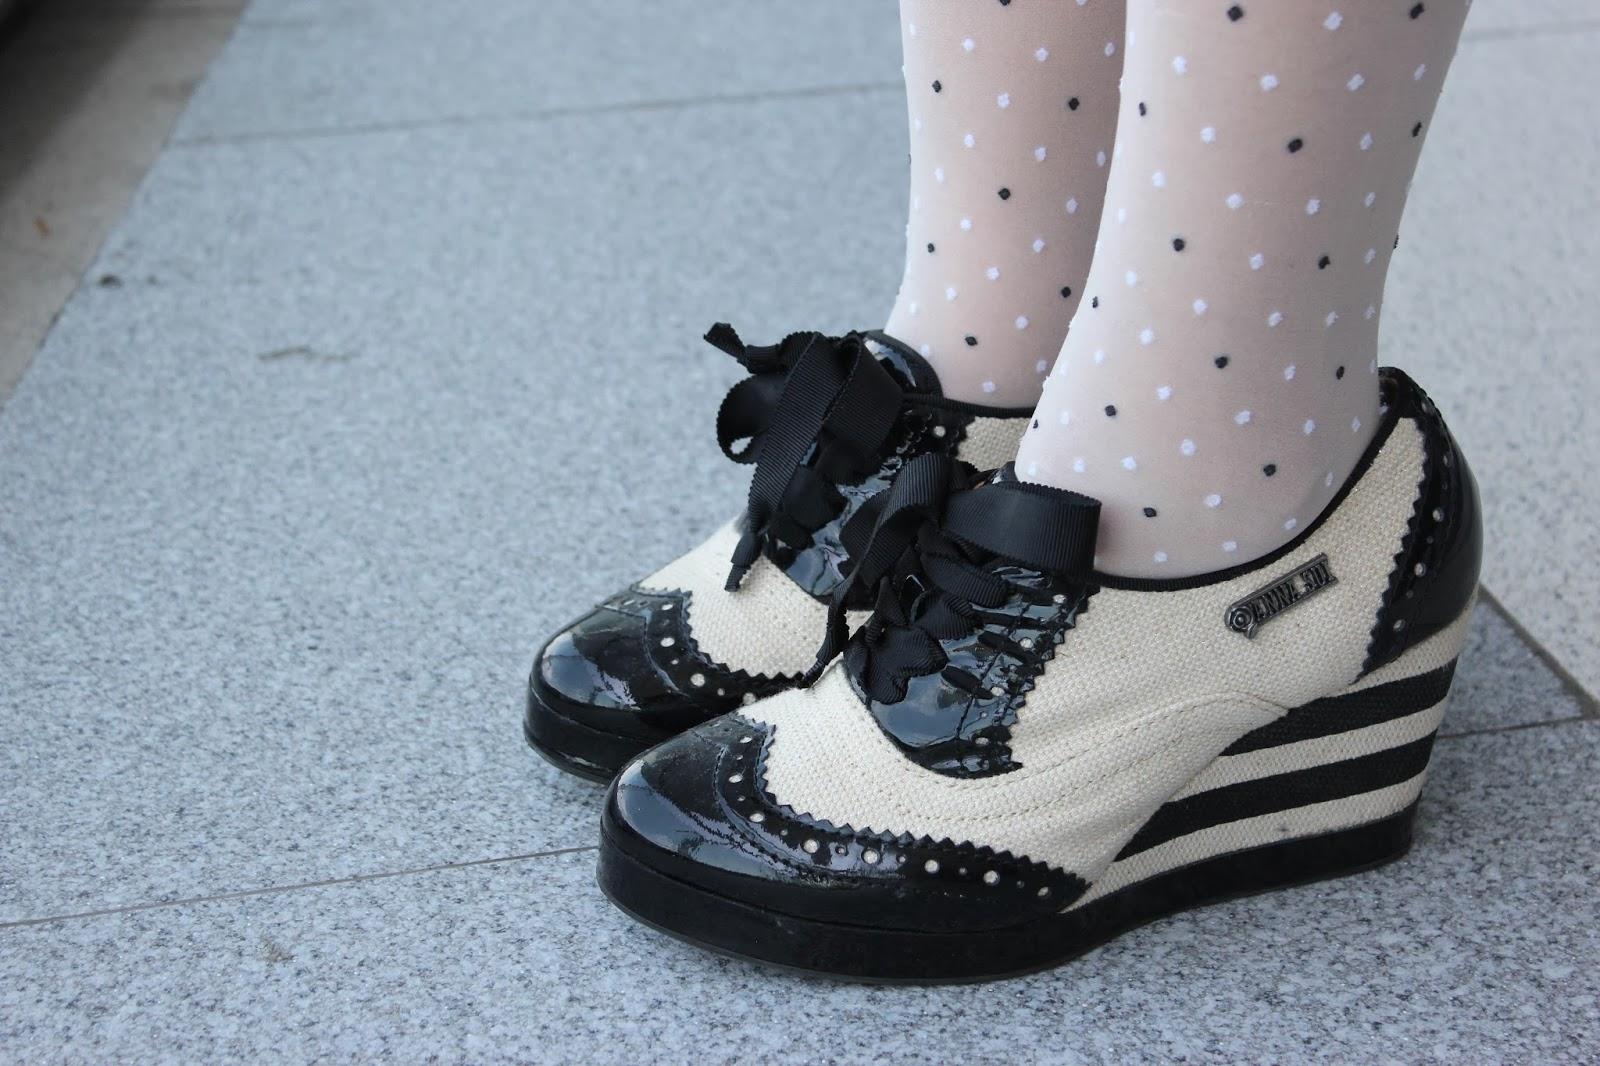 shoes, anna sui hush puppies, anna sui x hushpuppies, hushpuppies, polkadot stocking